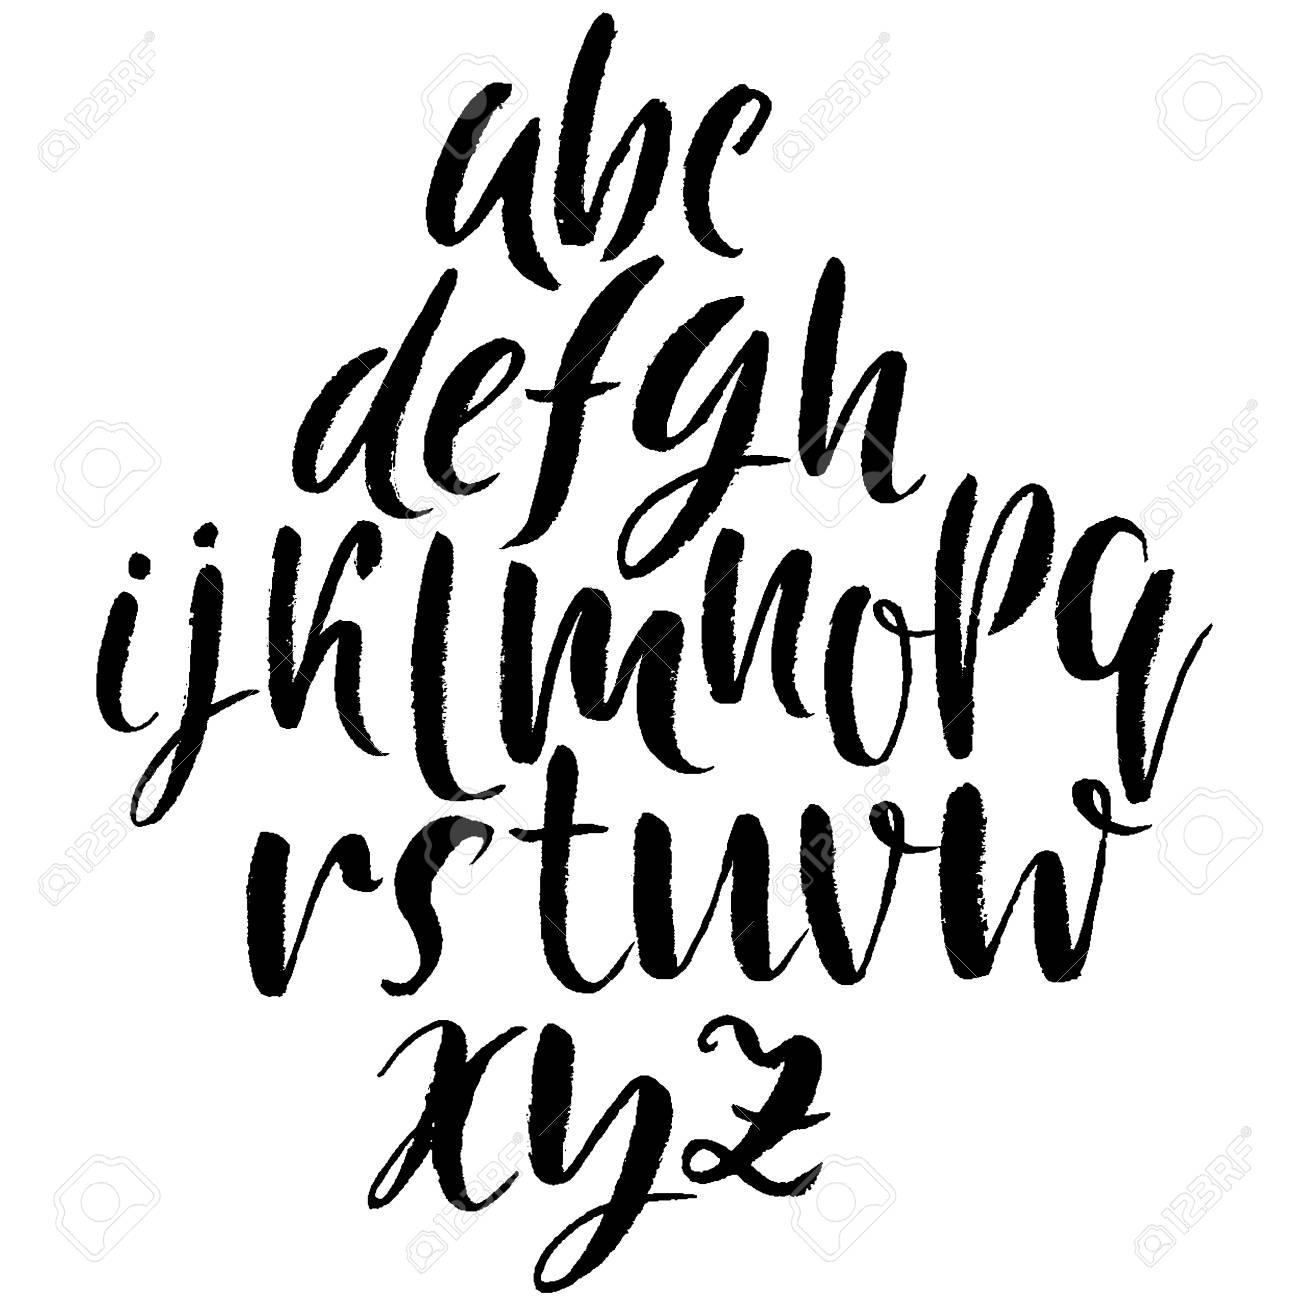 Hand Drawn Dry Brush Font Modern Lettering Grunge Style Alphabet Calligraphy Script